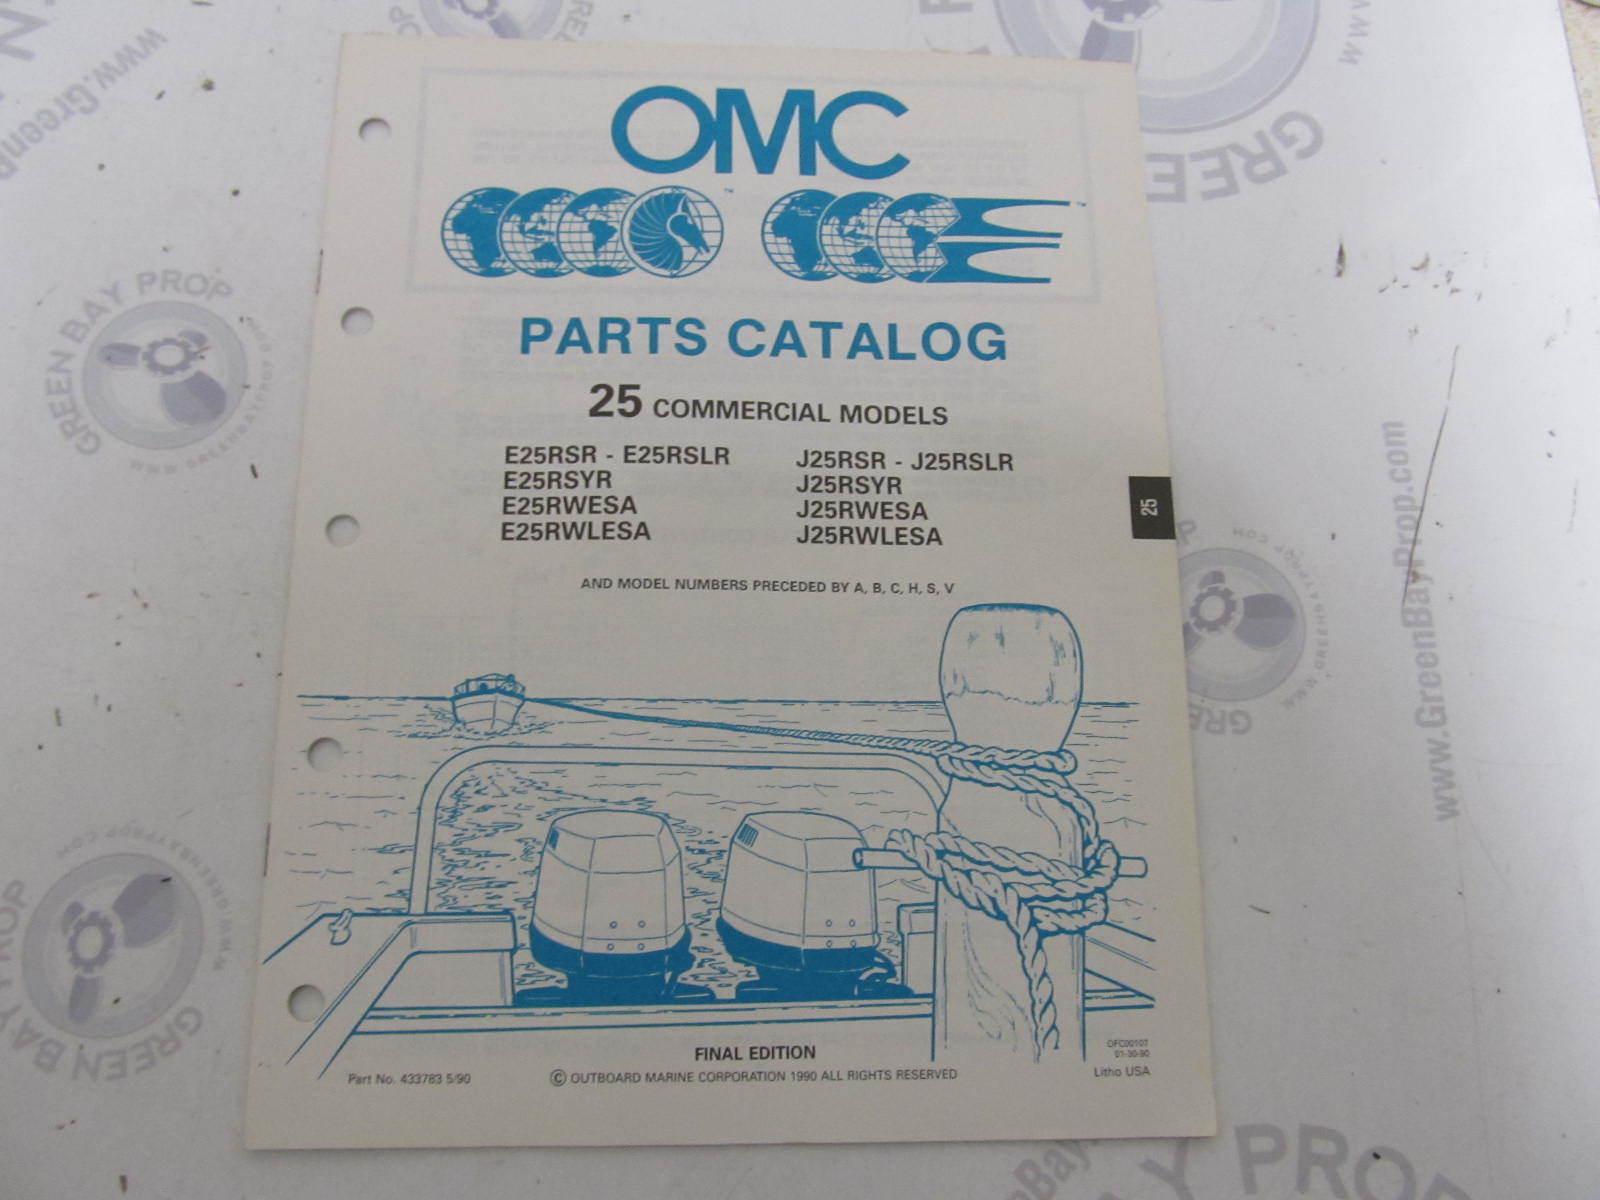 433783 1990 OMC Evinrude Johnson Outboard Parts Catalog 25 HP COMM